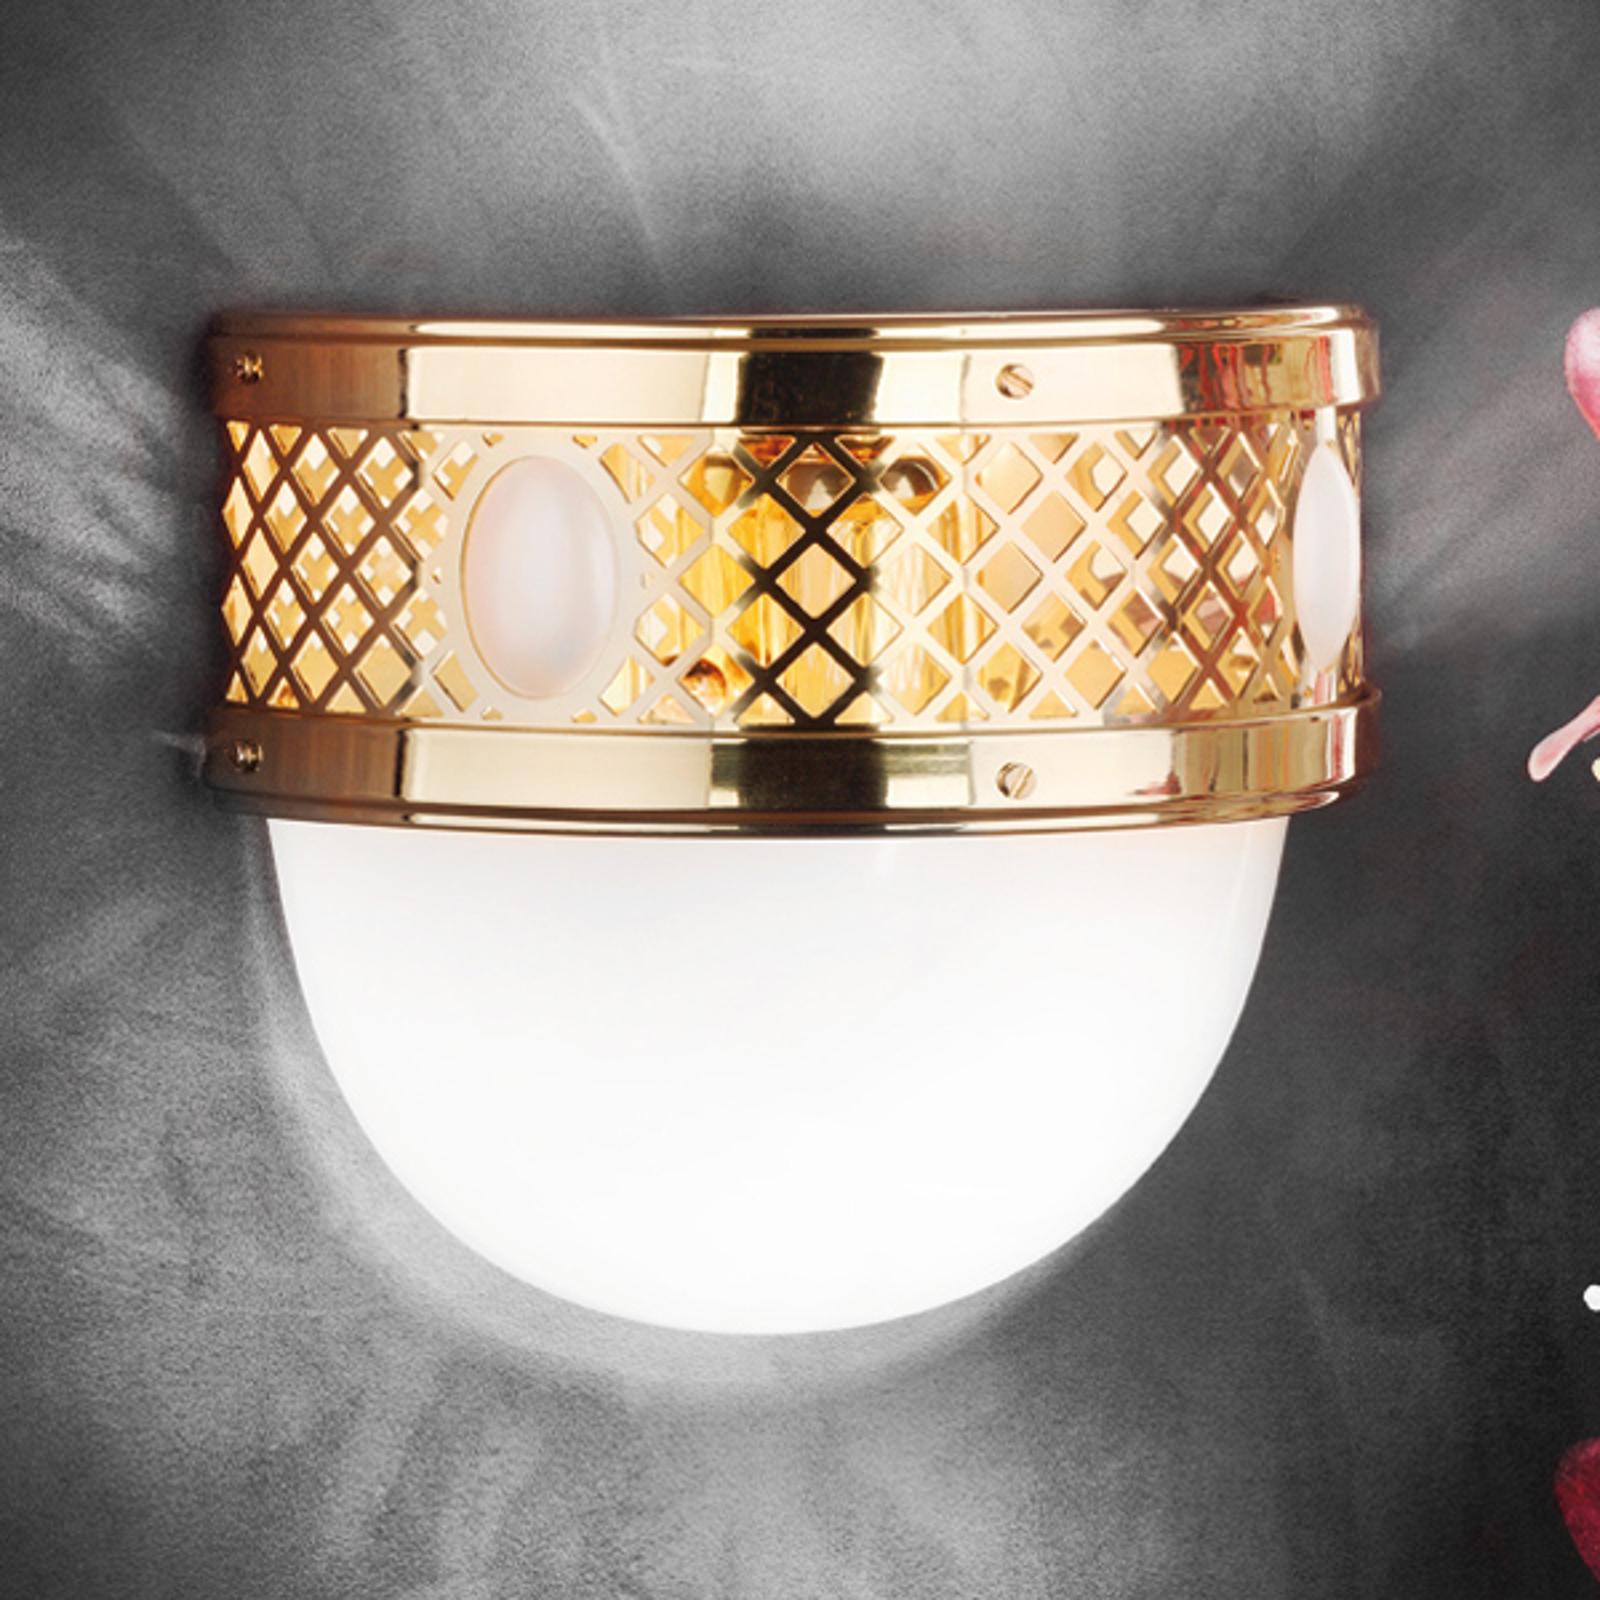 Halfronde wandlamp ALT WIEN, messing